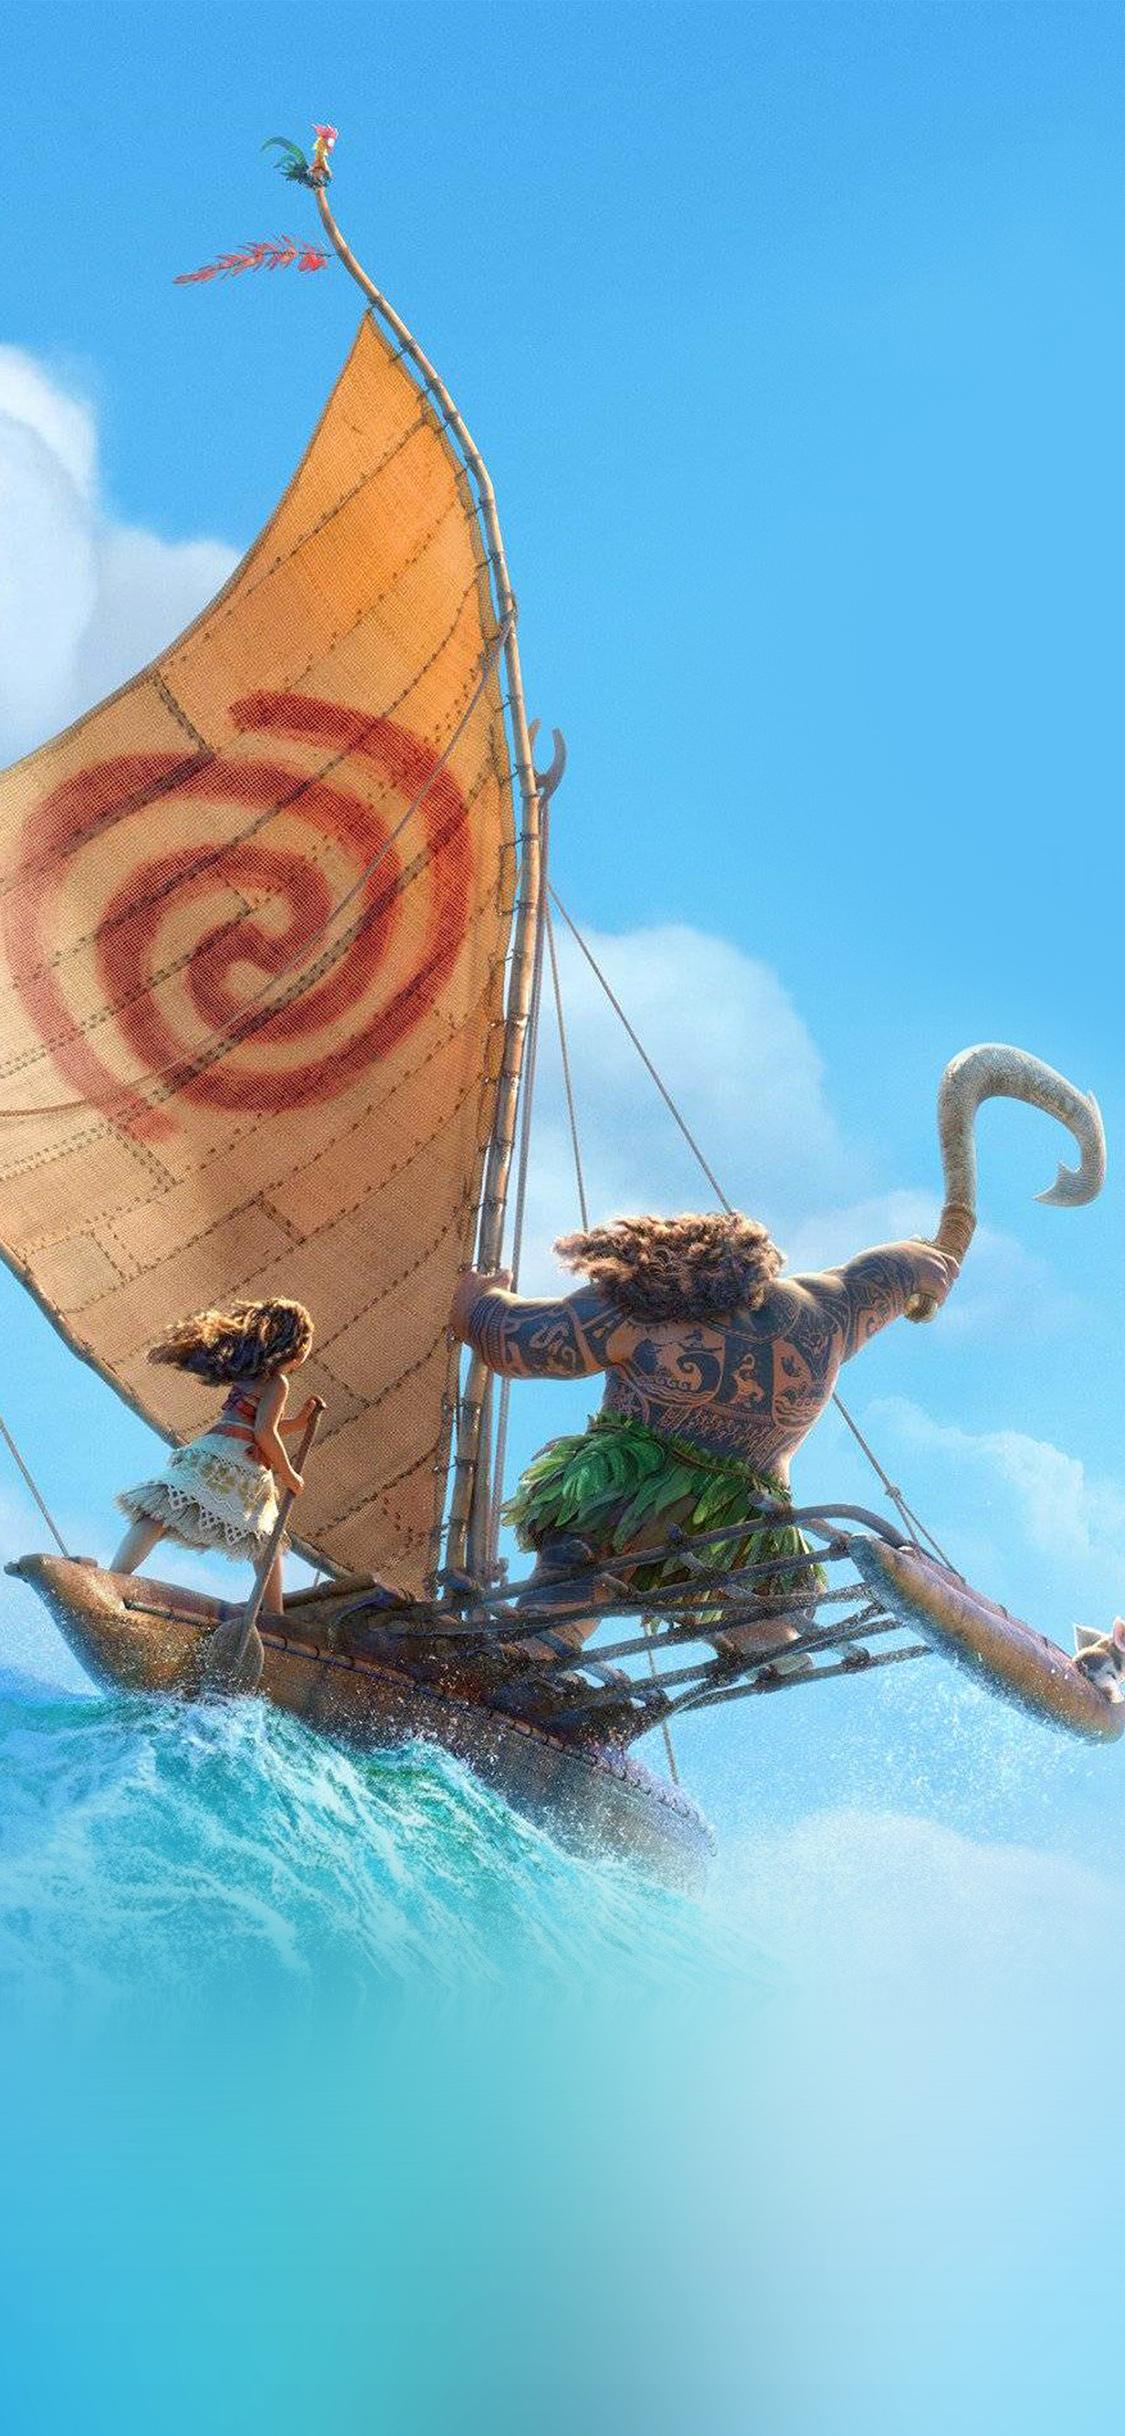 iPhoneXpapers.com-Apple-iPhone-wallpaper-aw39-surf-moana-disney-film-anime-summer-sea-illustration-art